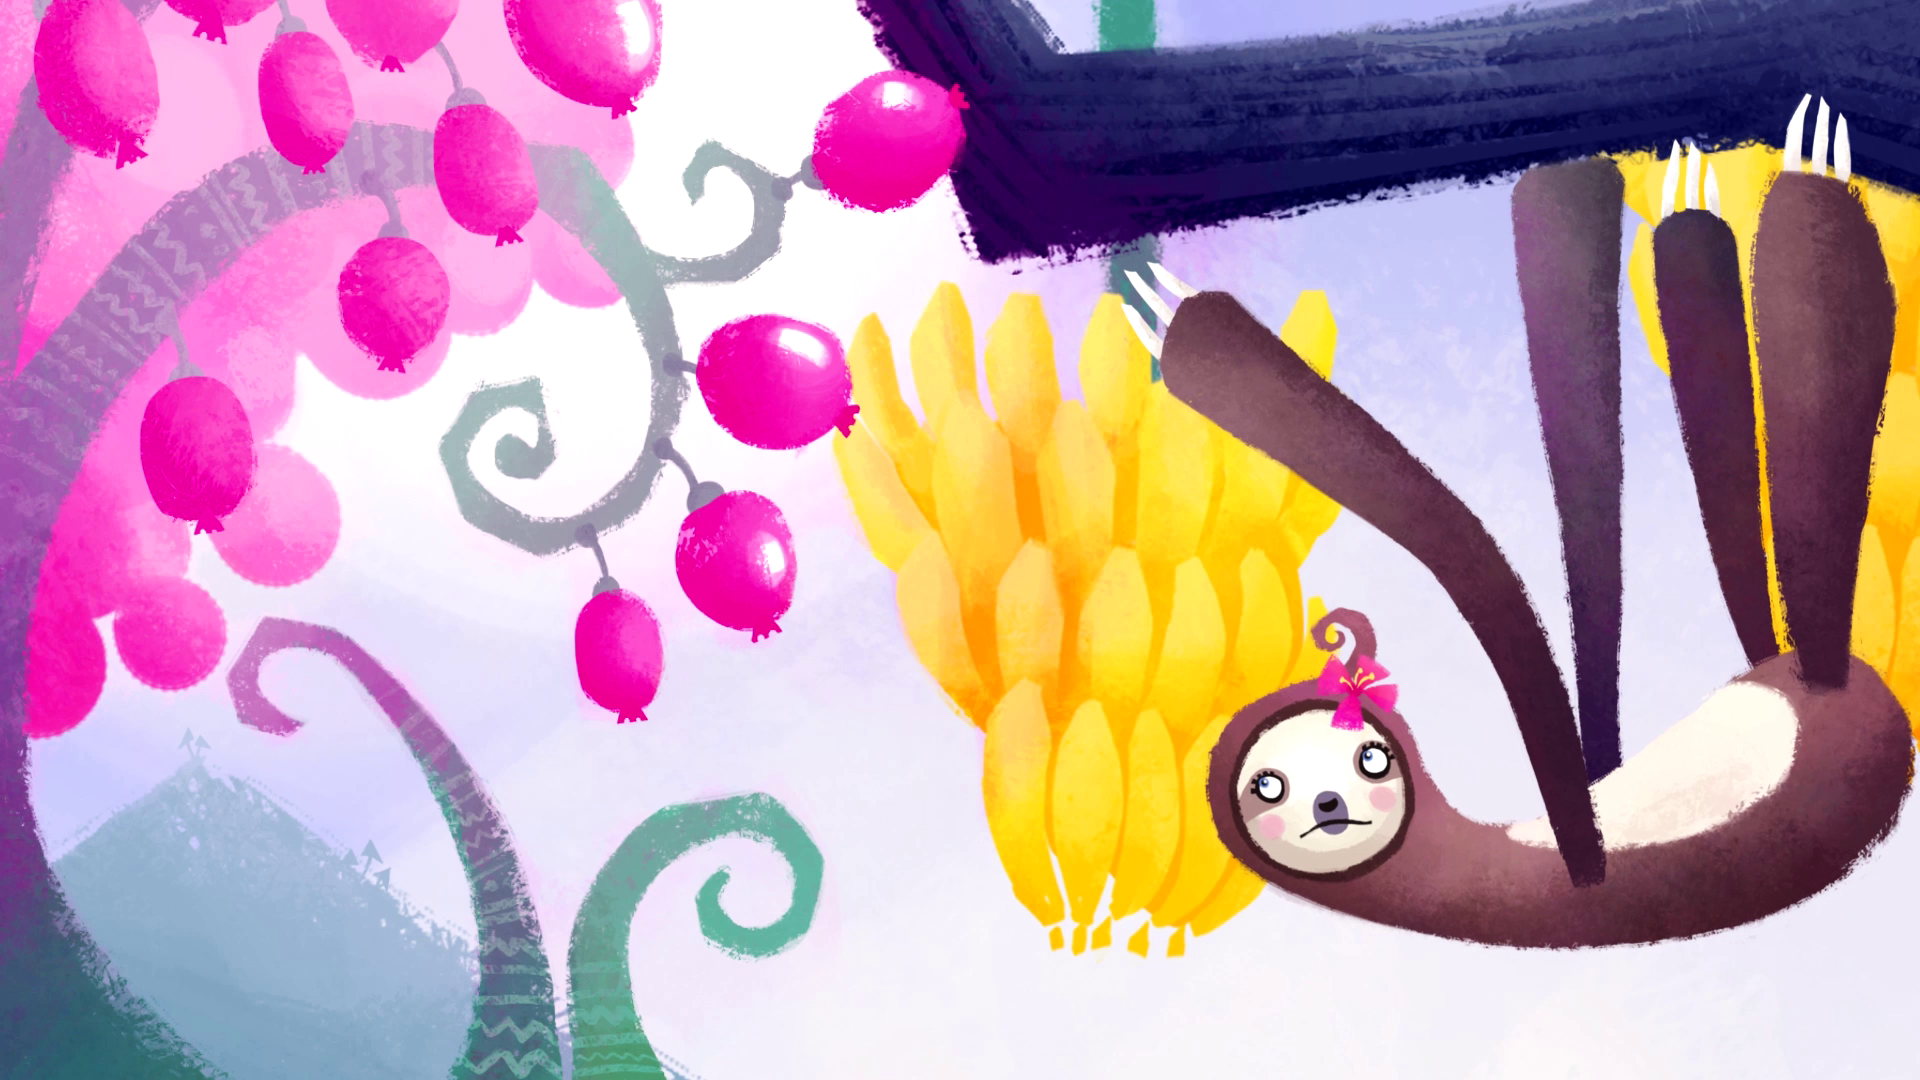 Sloth_3.png